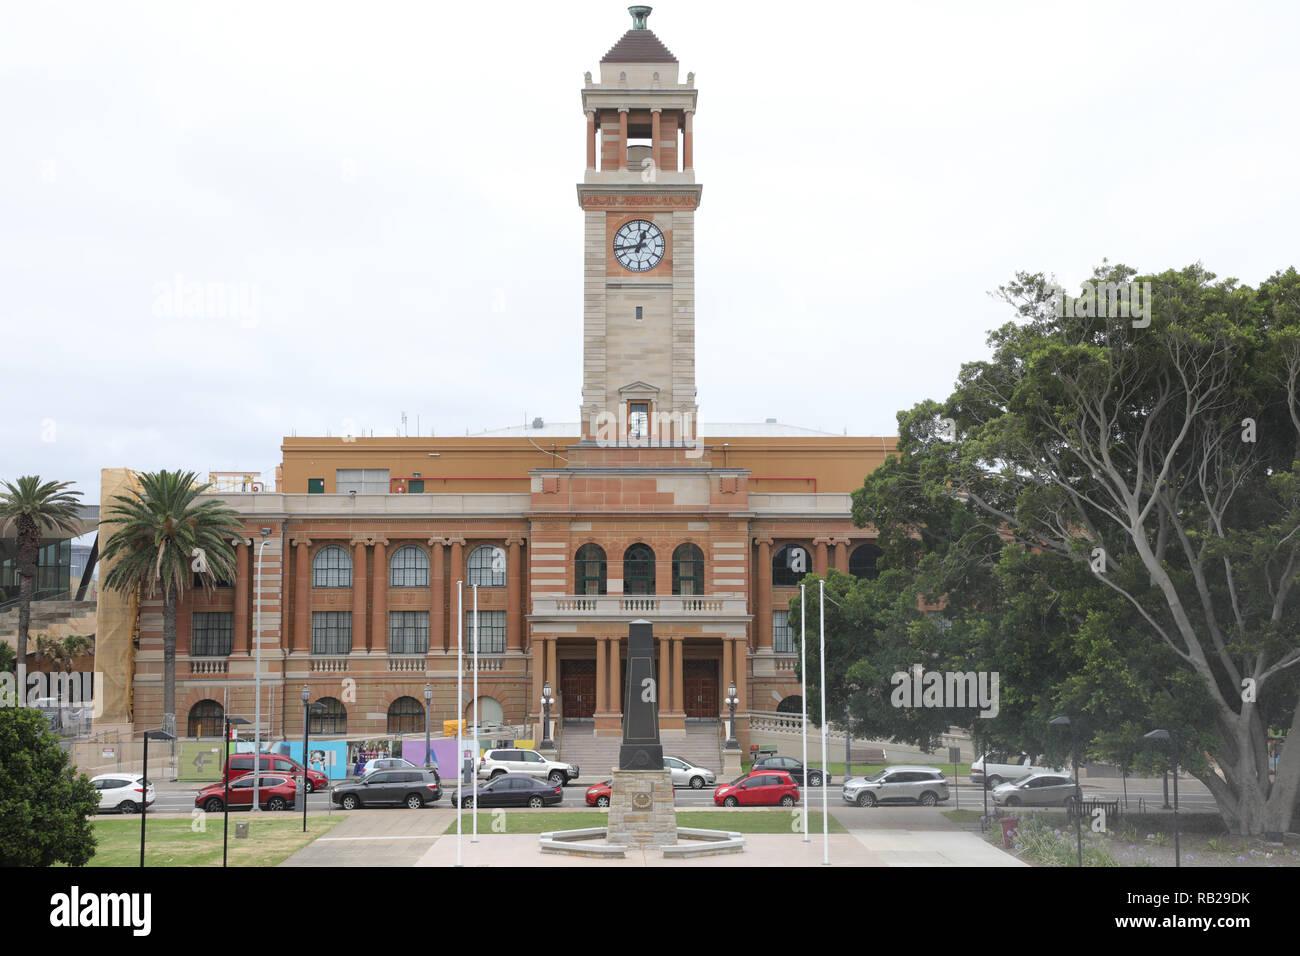 Chubby brown newcastle city hall, nakednubiles pron